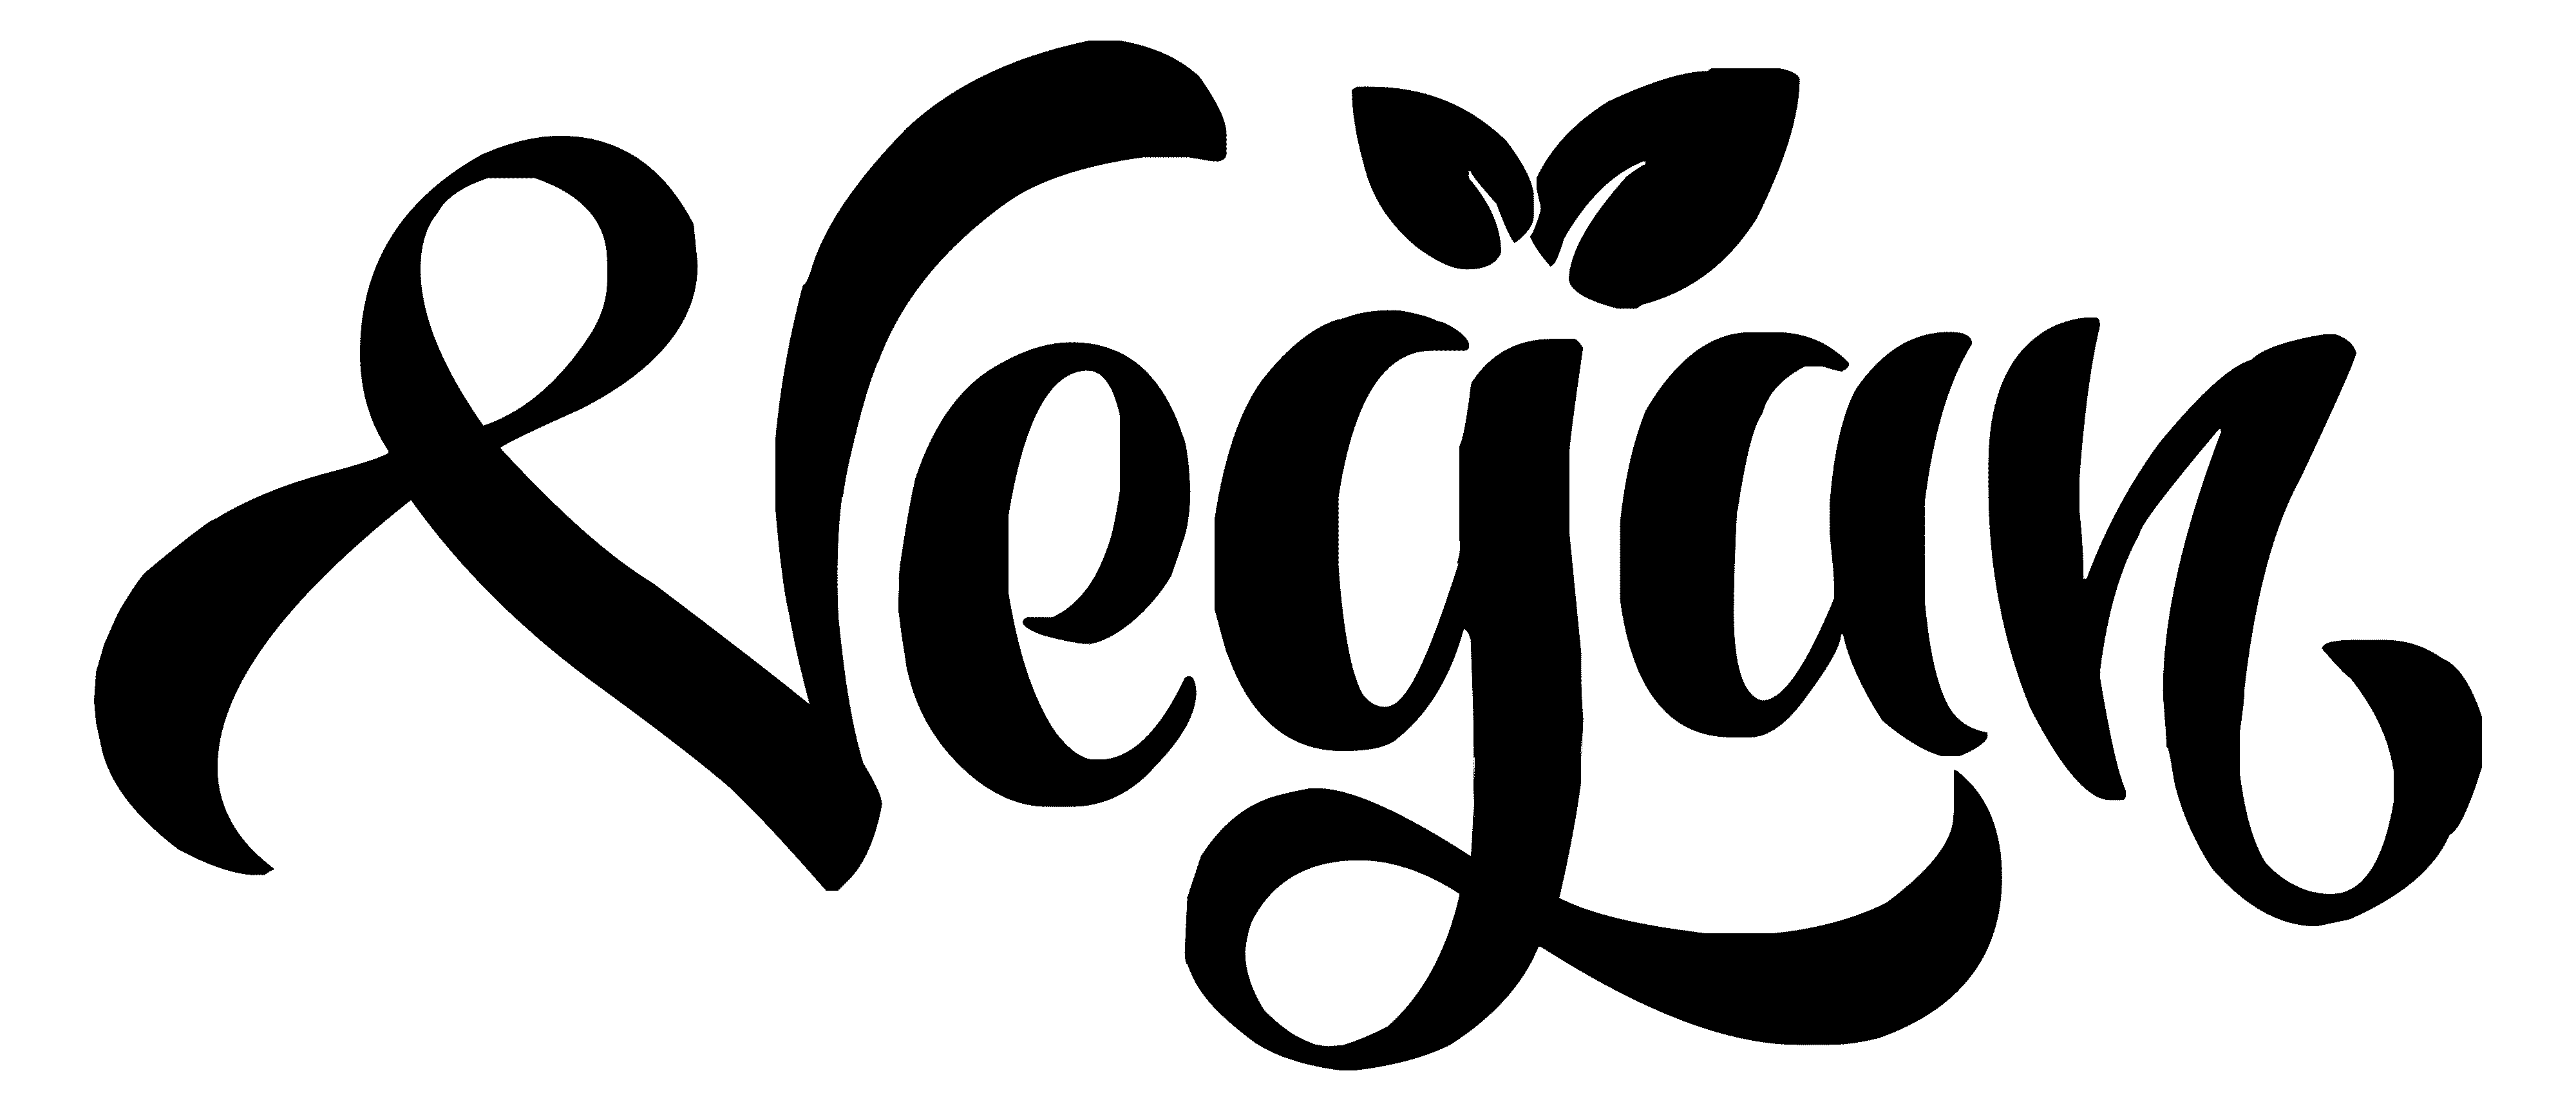 Bullet clipart royalty free symbols and logos image freeuse library Ⓥ - Vegan Symbols / Emojis / Copyright-Free Clipart | Copy/Paste ... image freeuse library